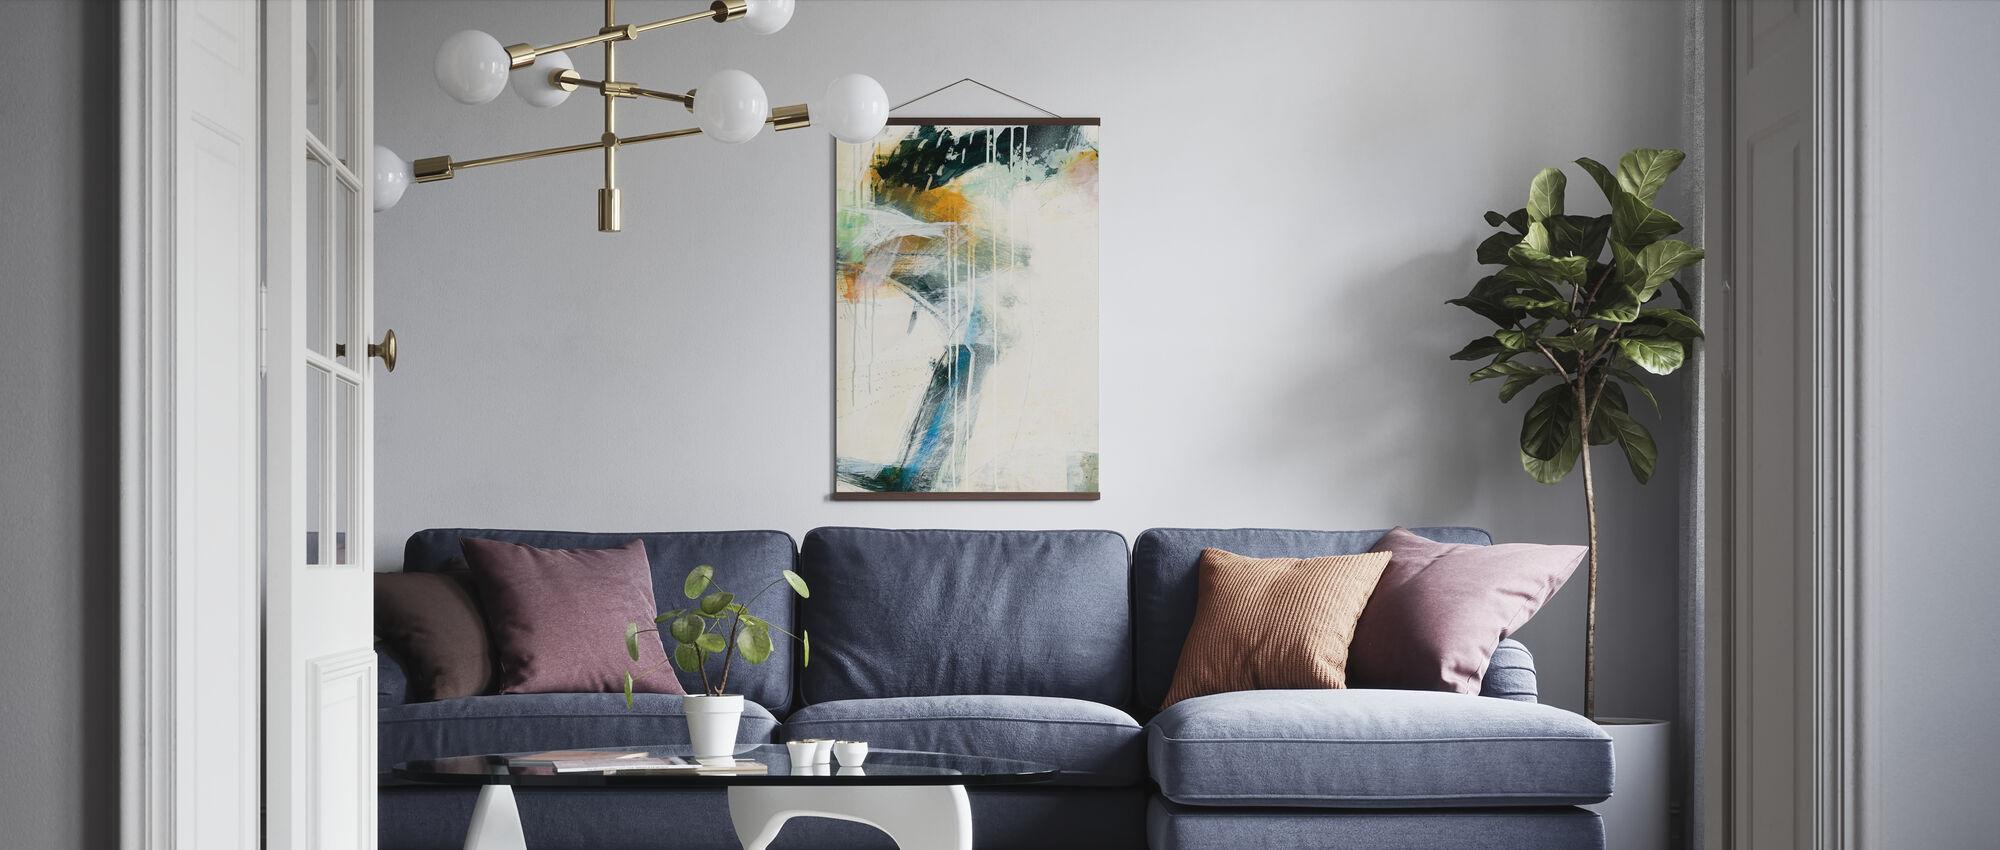 Turbulence II - Poster - Living Room